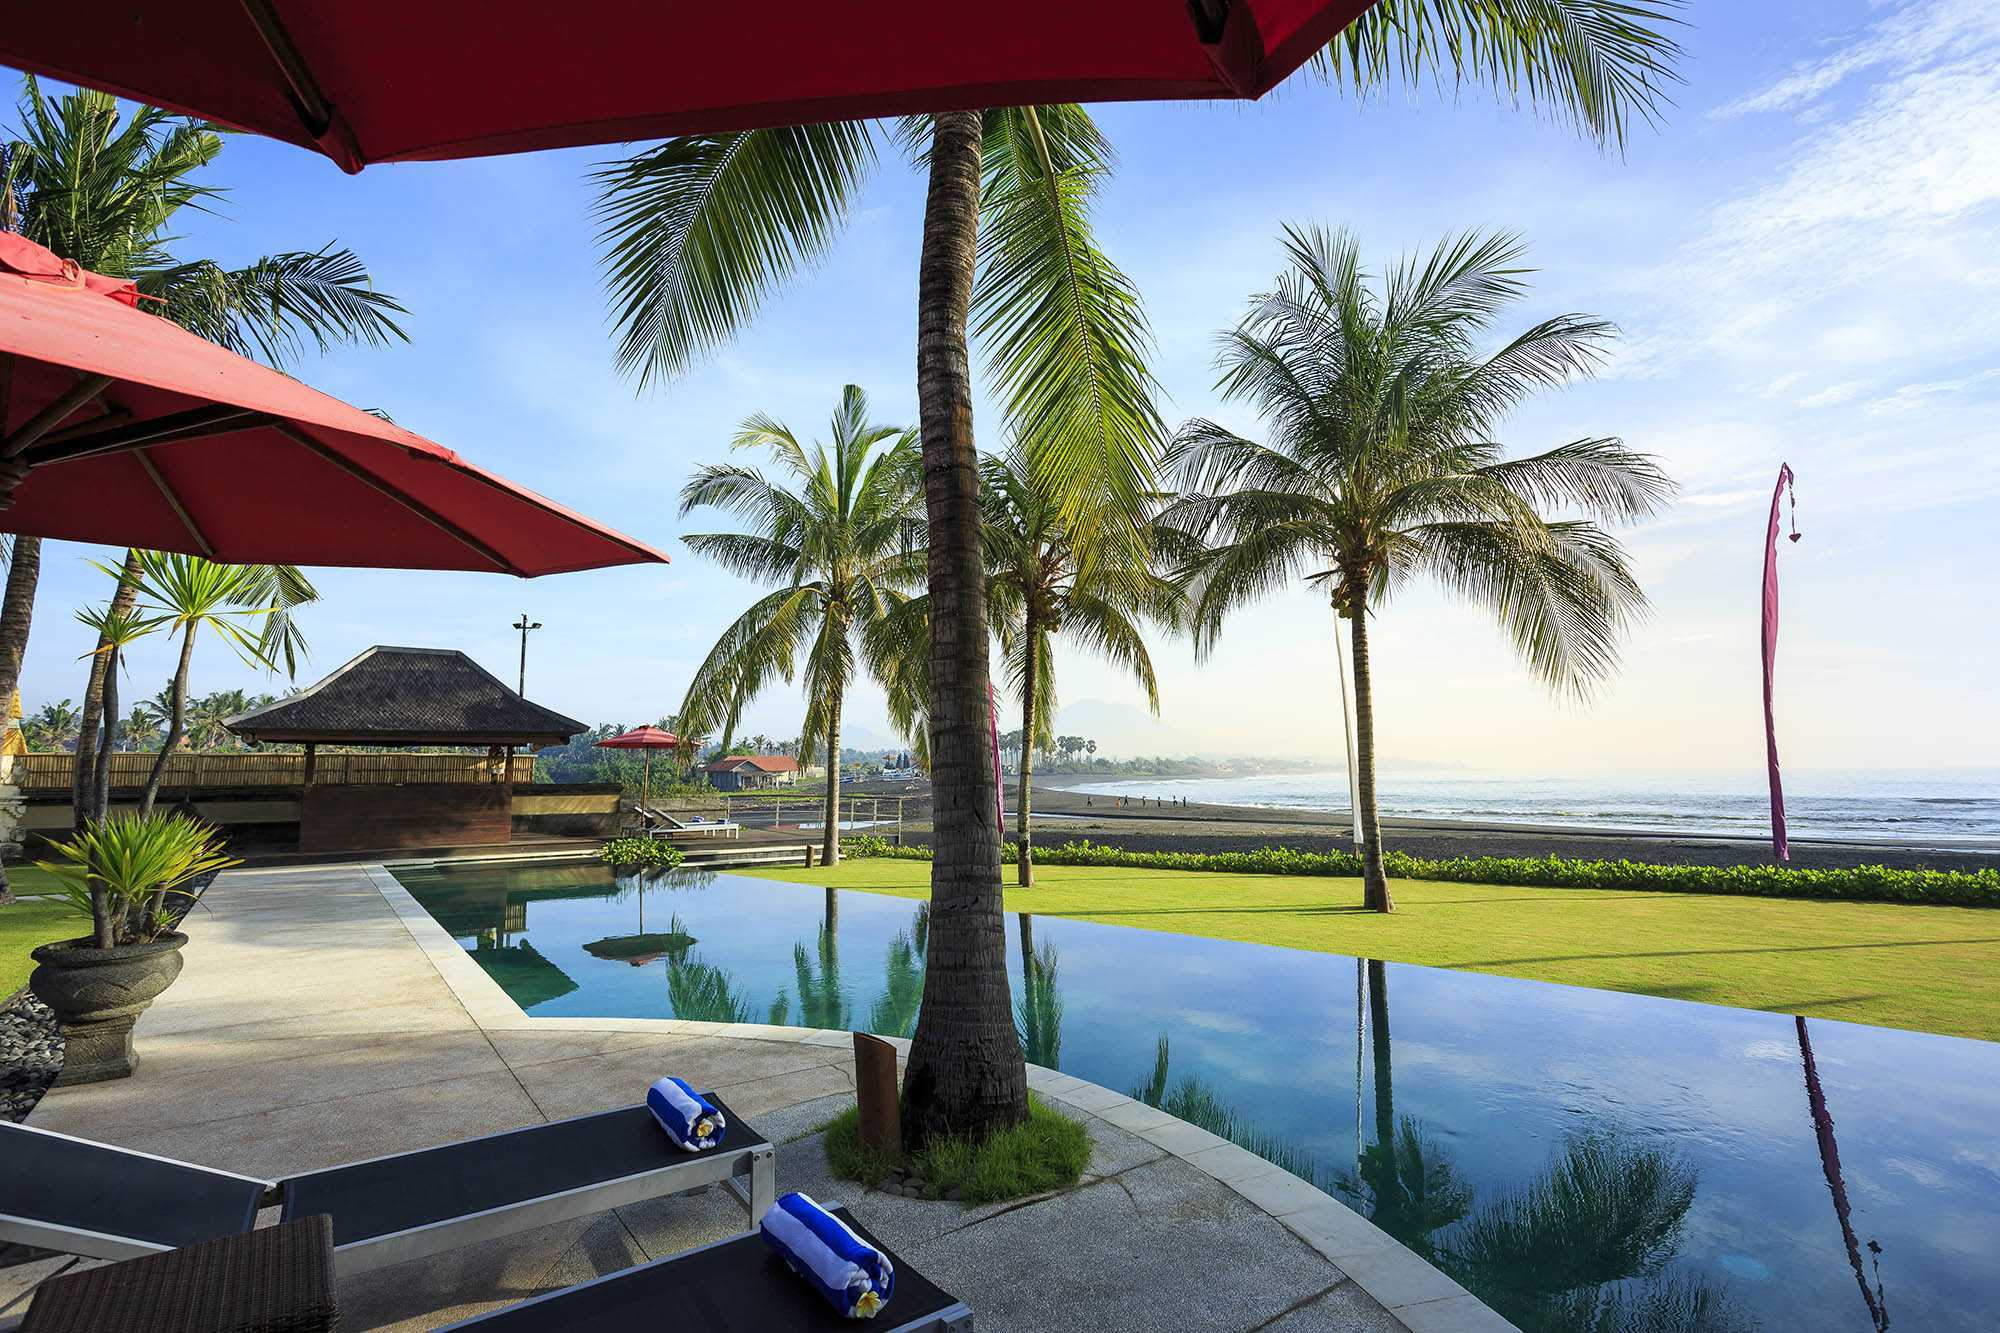 Agung Budi Raharsa   Architecture & Engineering Pushpapuri Villa - Bali Bali, Indonesia Bali, Indonesia Agung-Budi-Raharsa-Pushpapuri-Villa  88356